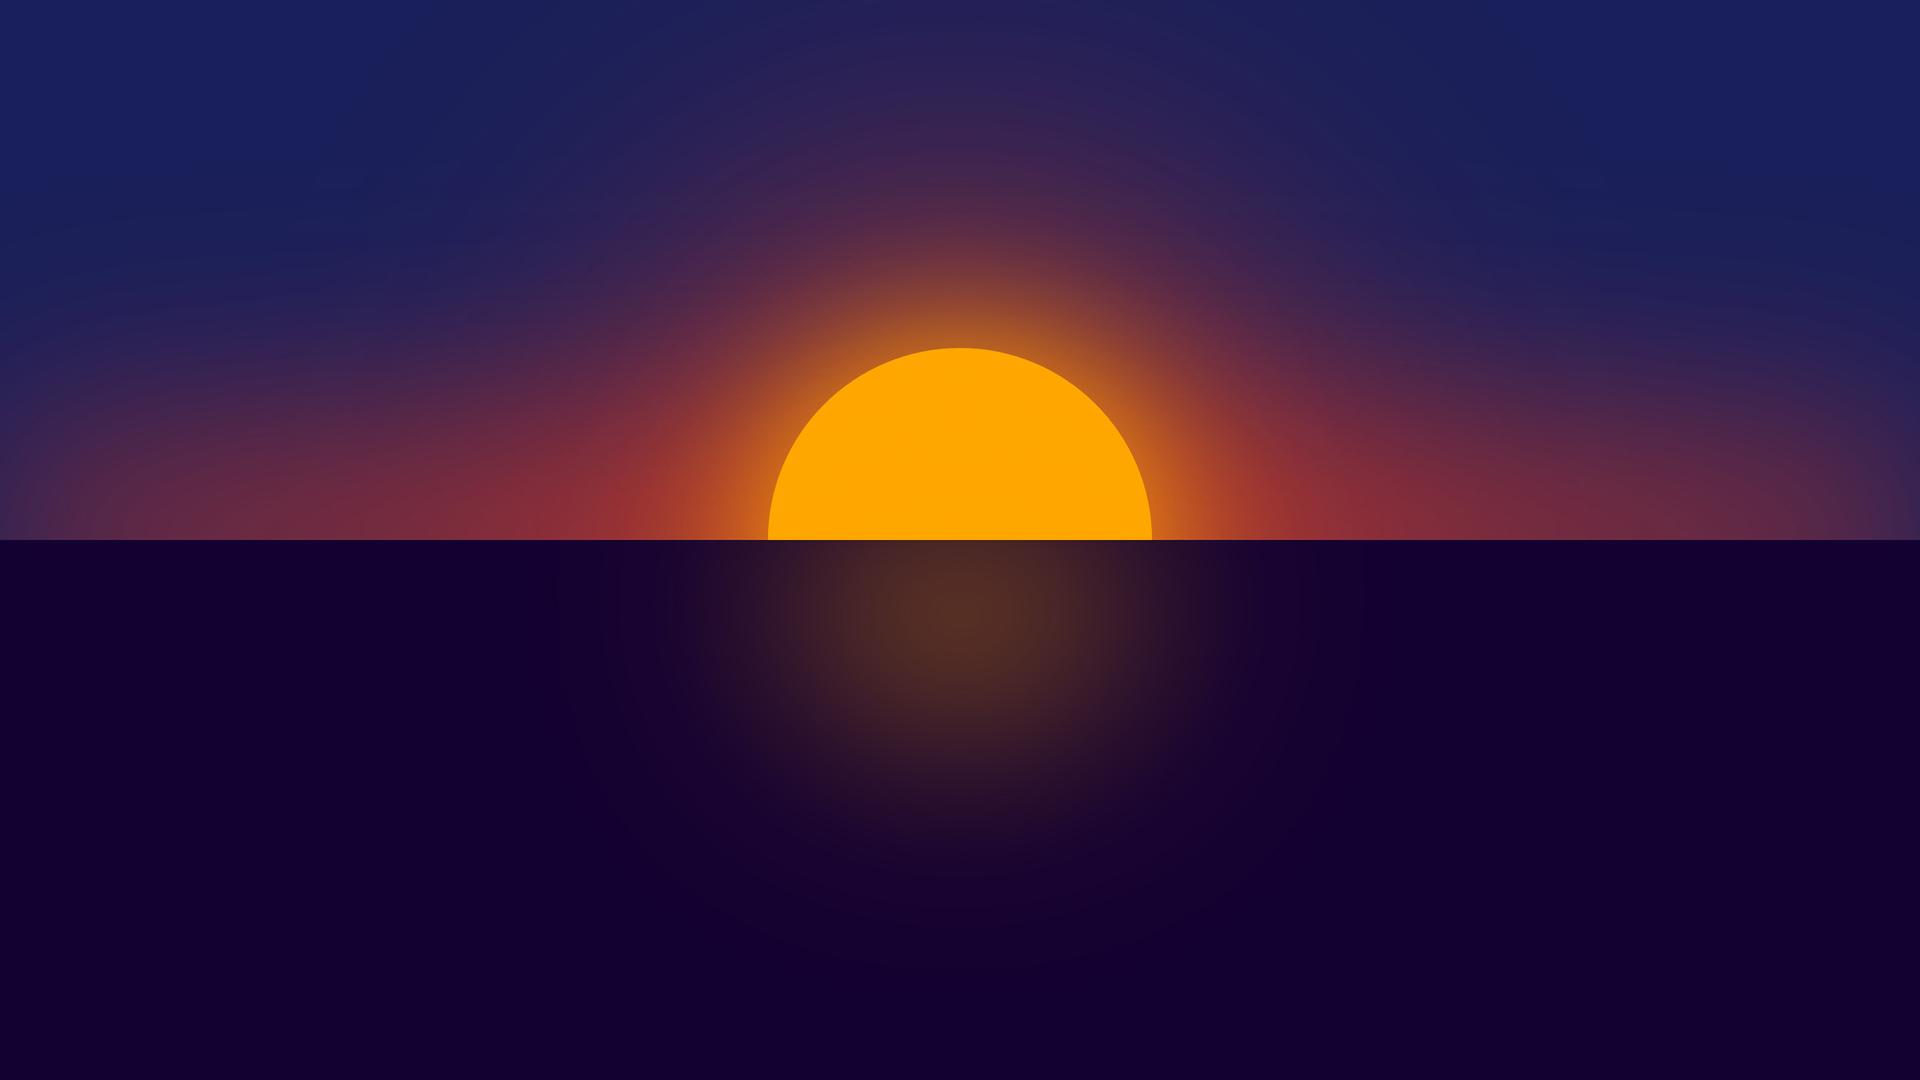 1920x1080 Clear Sunset Minimal 4k Laptop Full HD 1080P HD ...